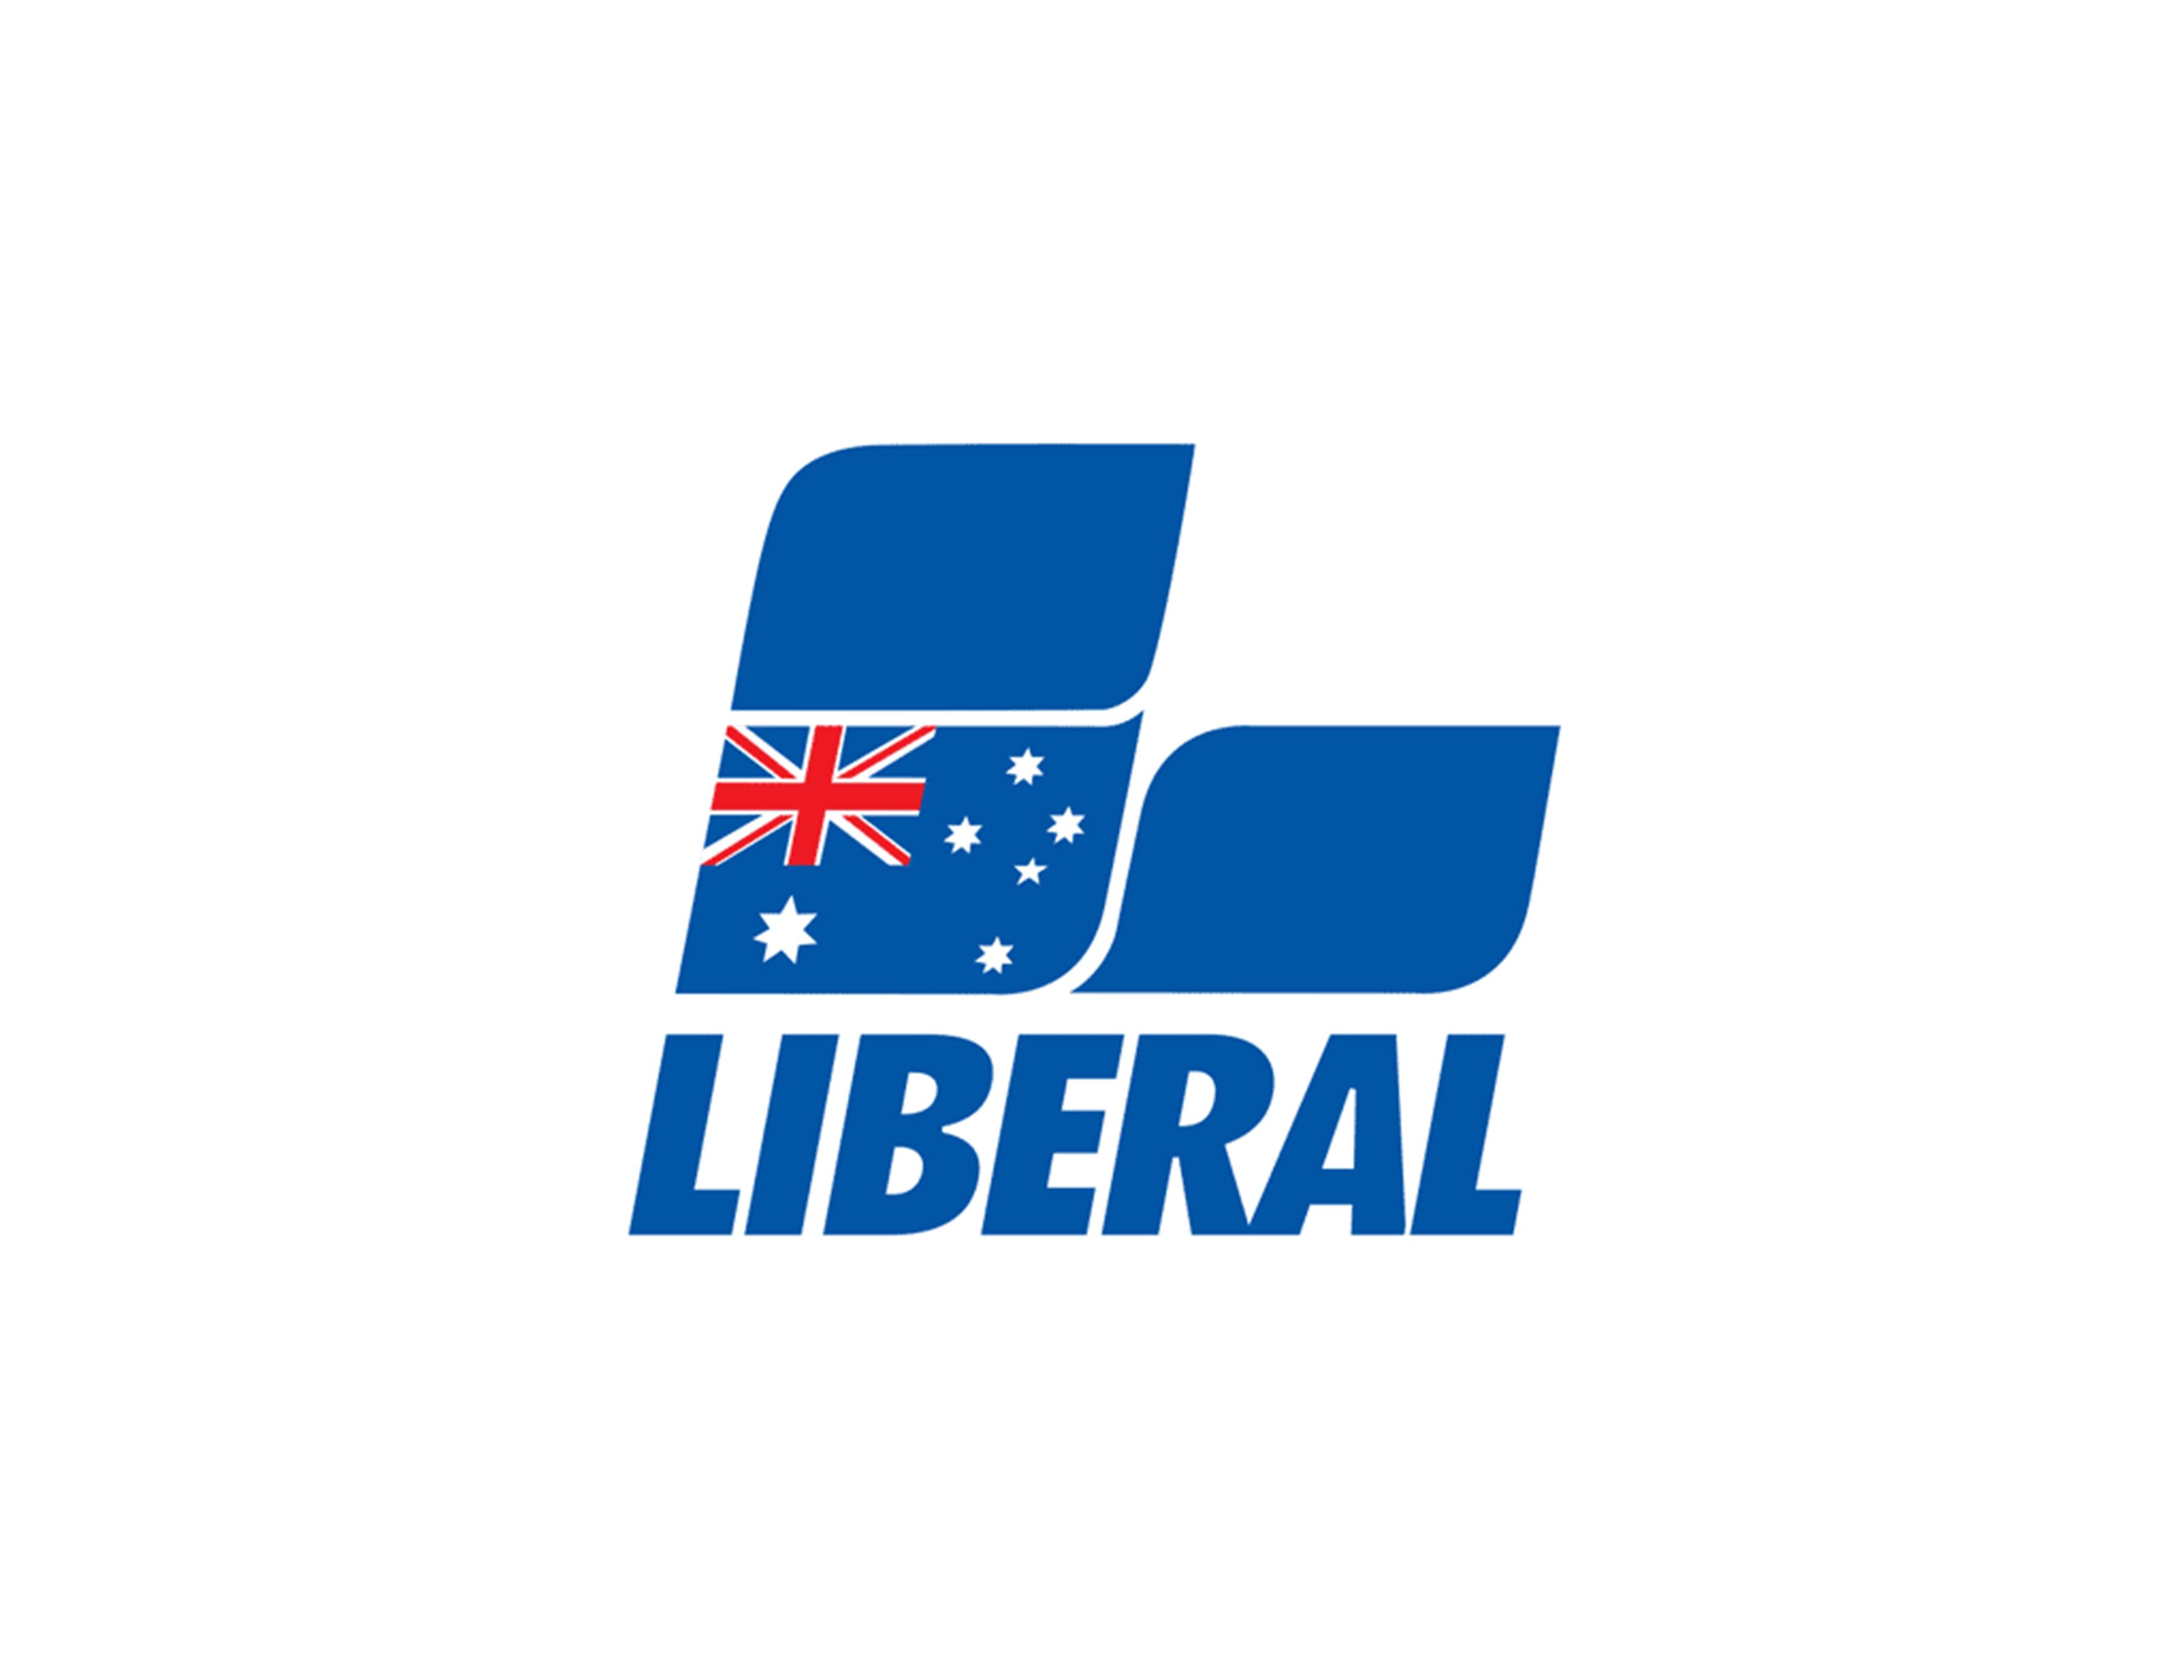 Australian liberal party - religion & politics logo inspiration ...